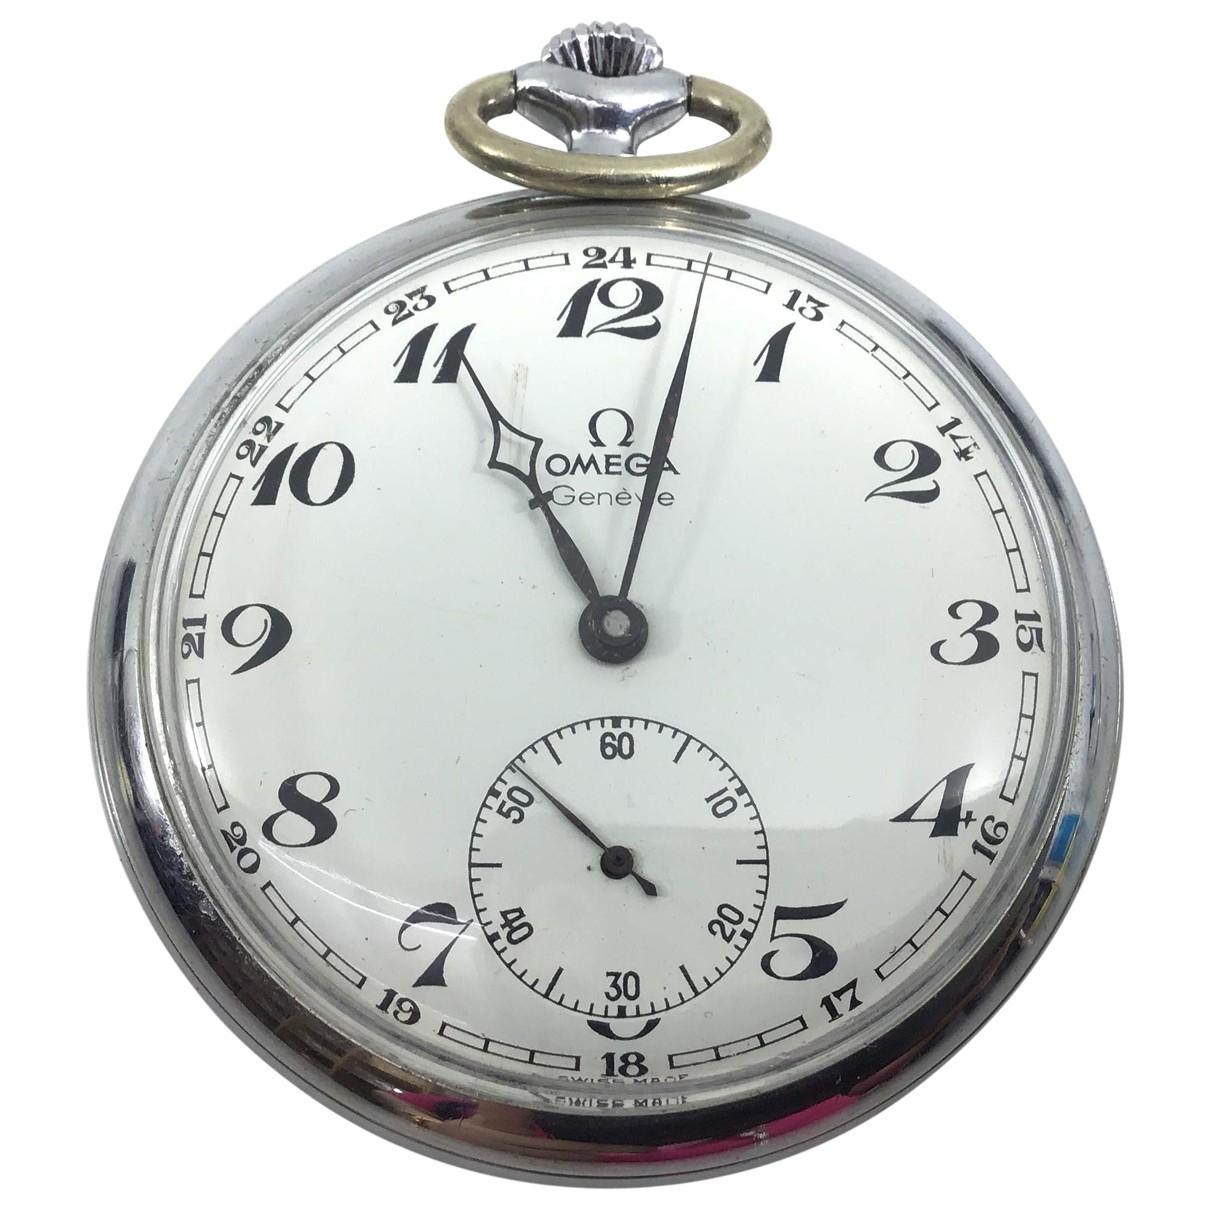 Omega \N Uhr in  Grau Stahl